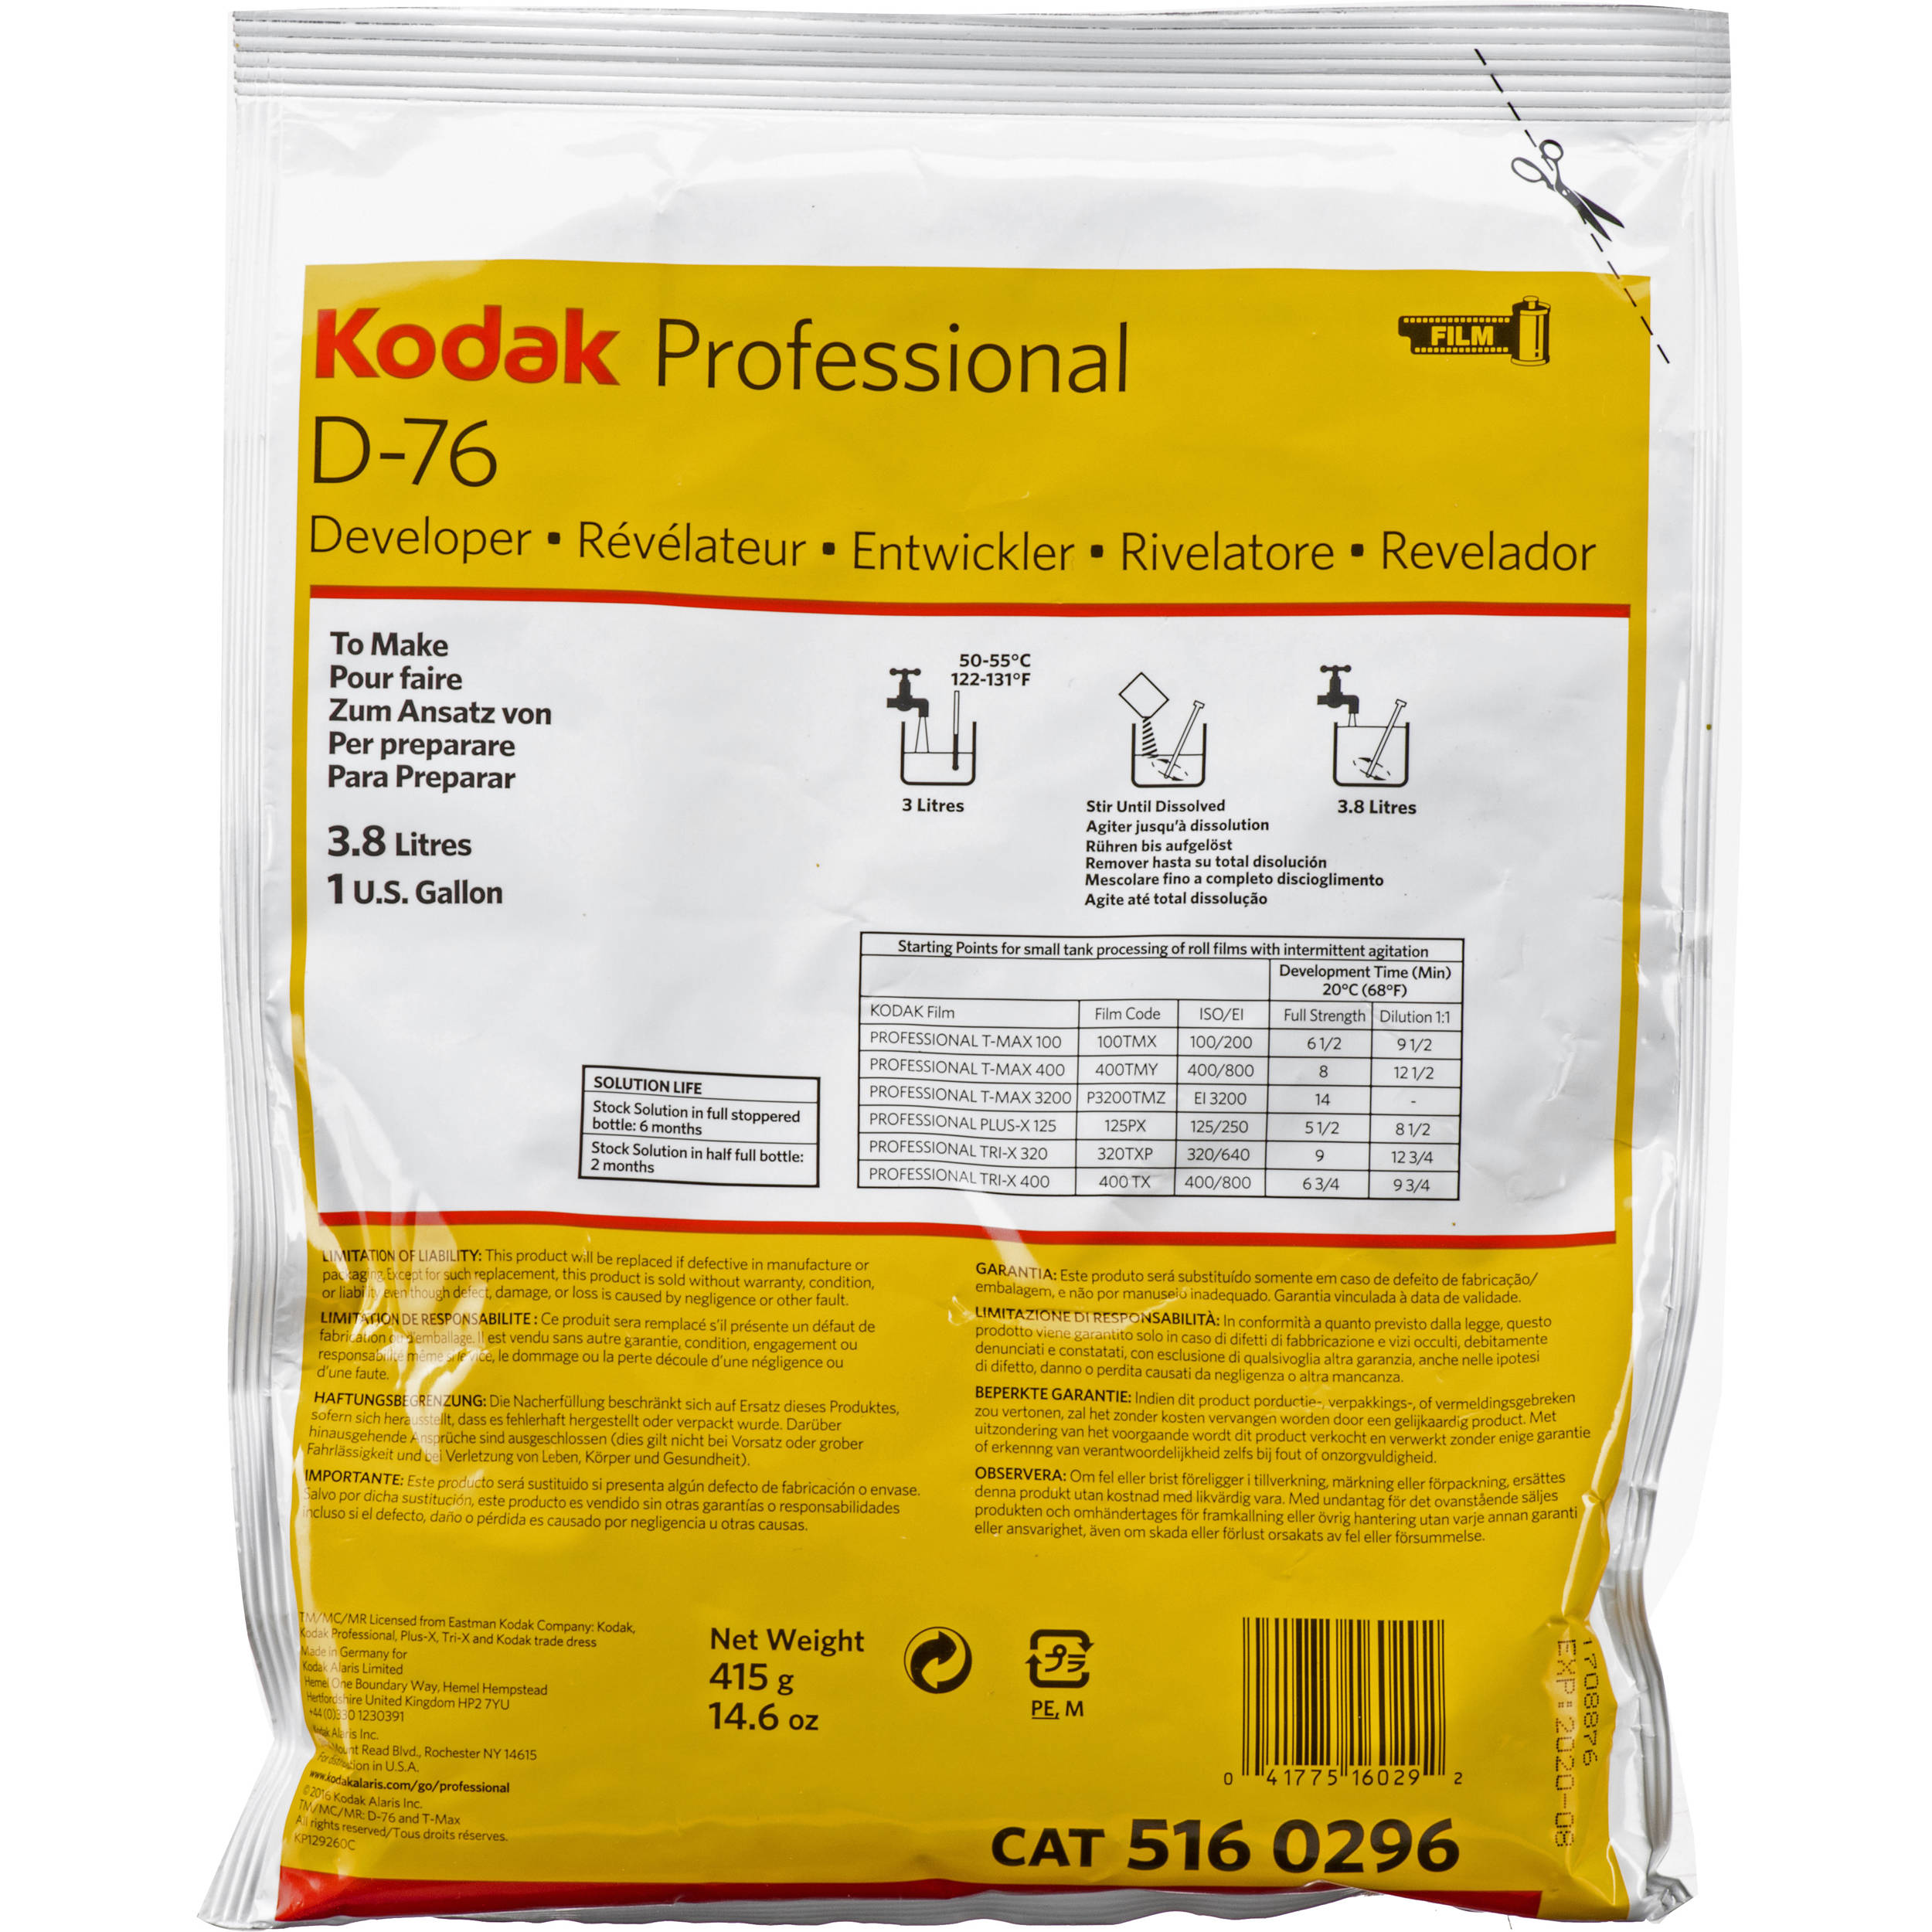 Keppler's Vault 64: Kodak D-76